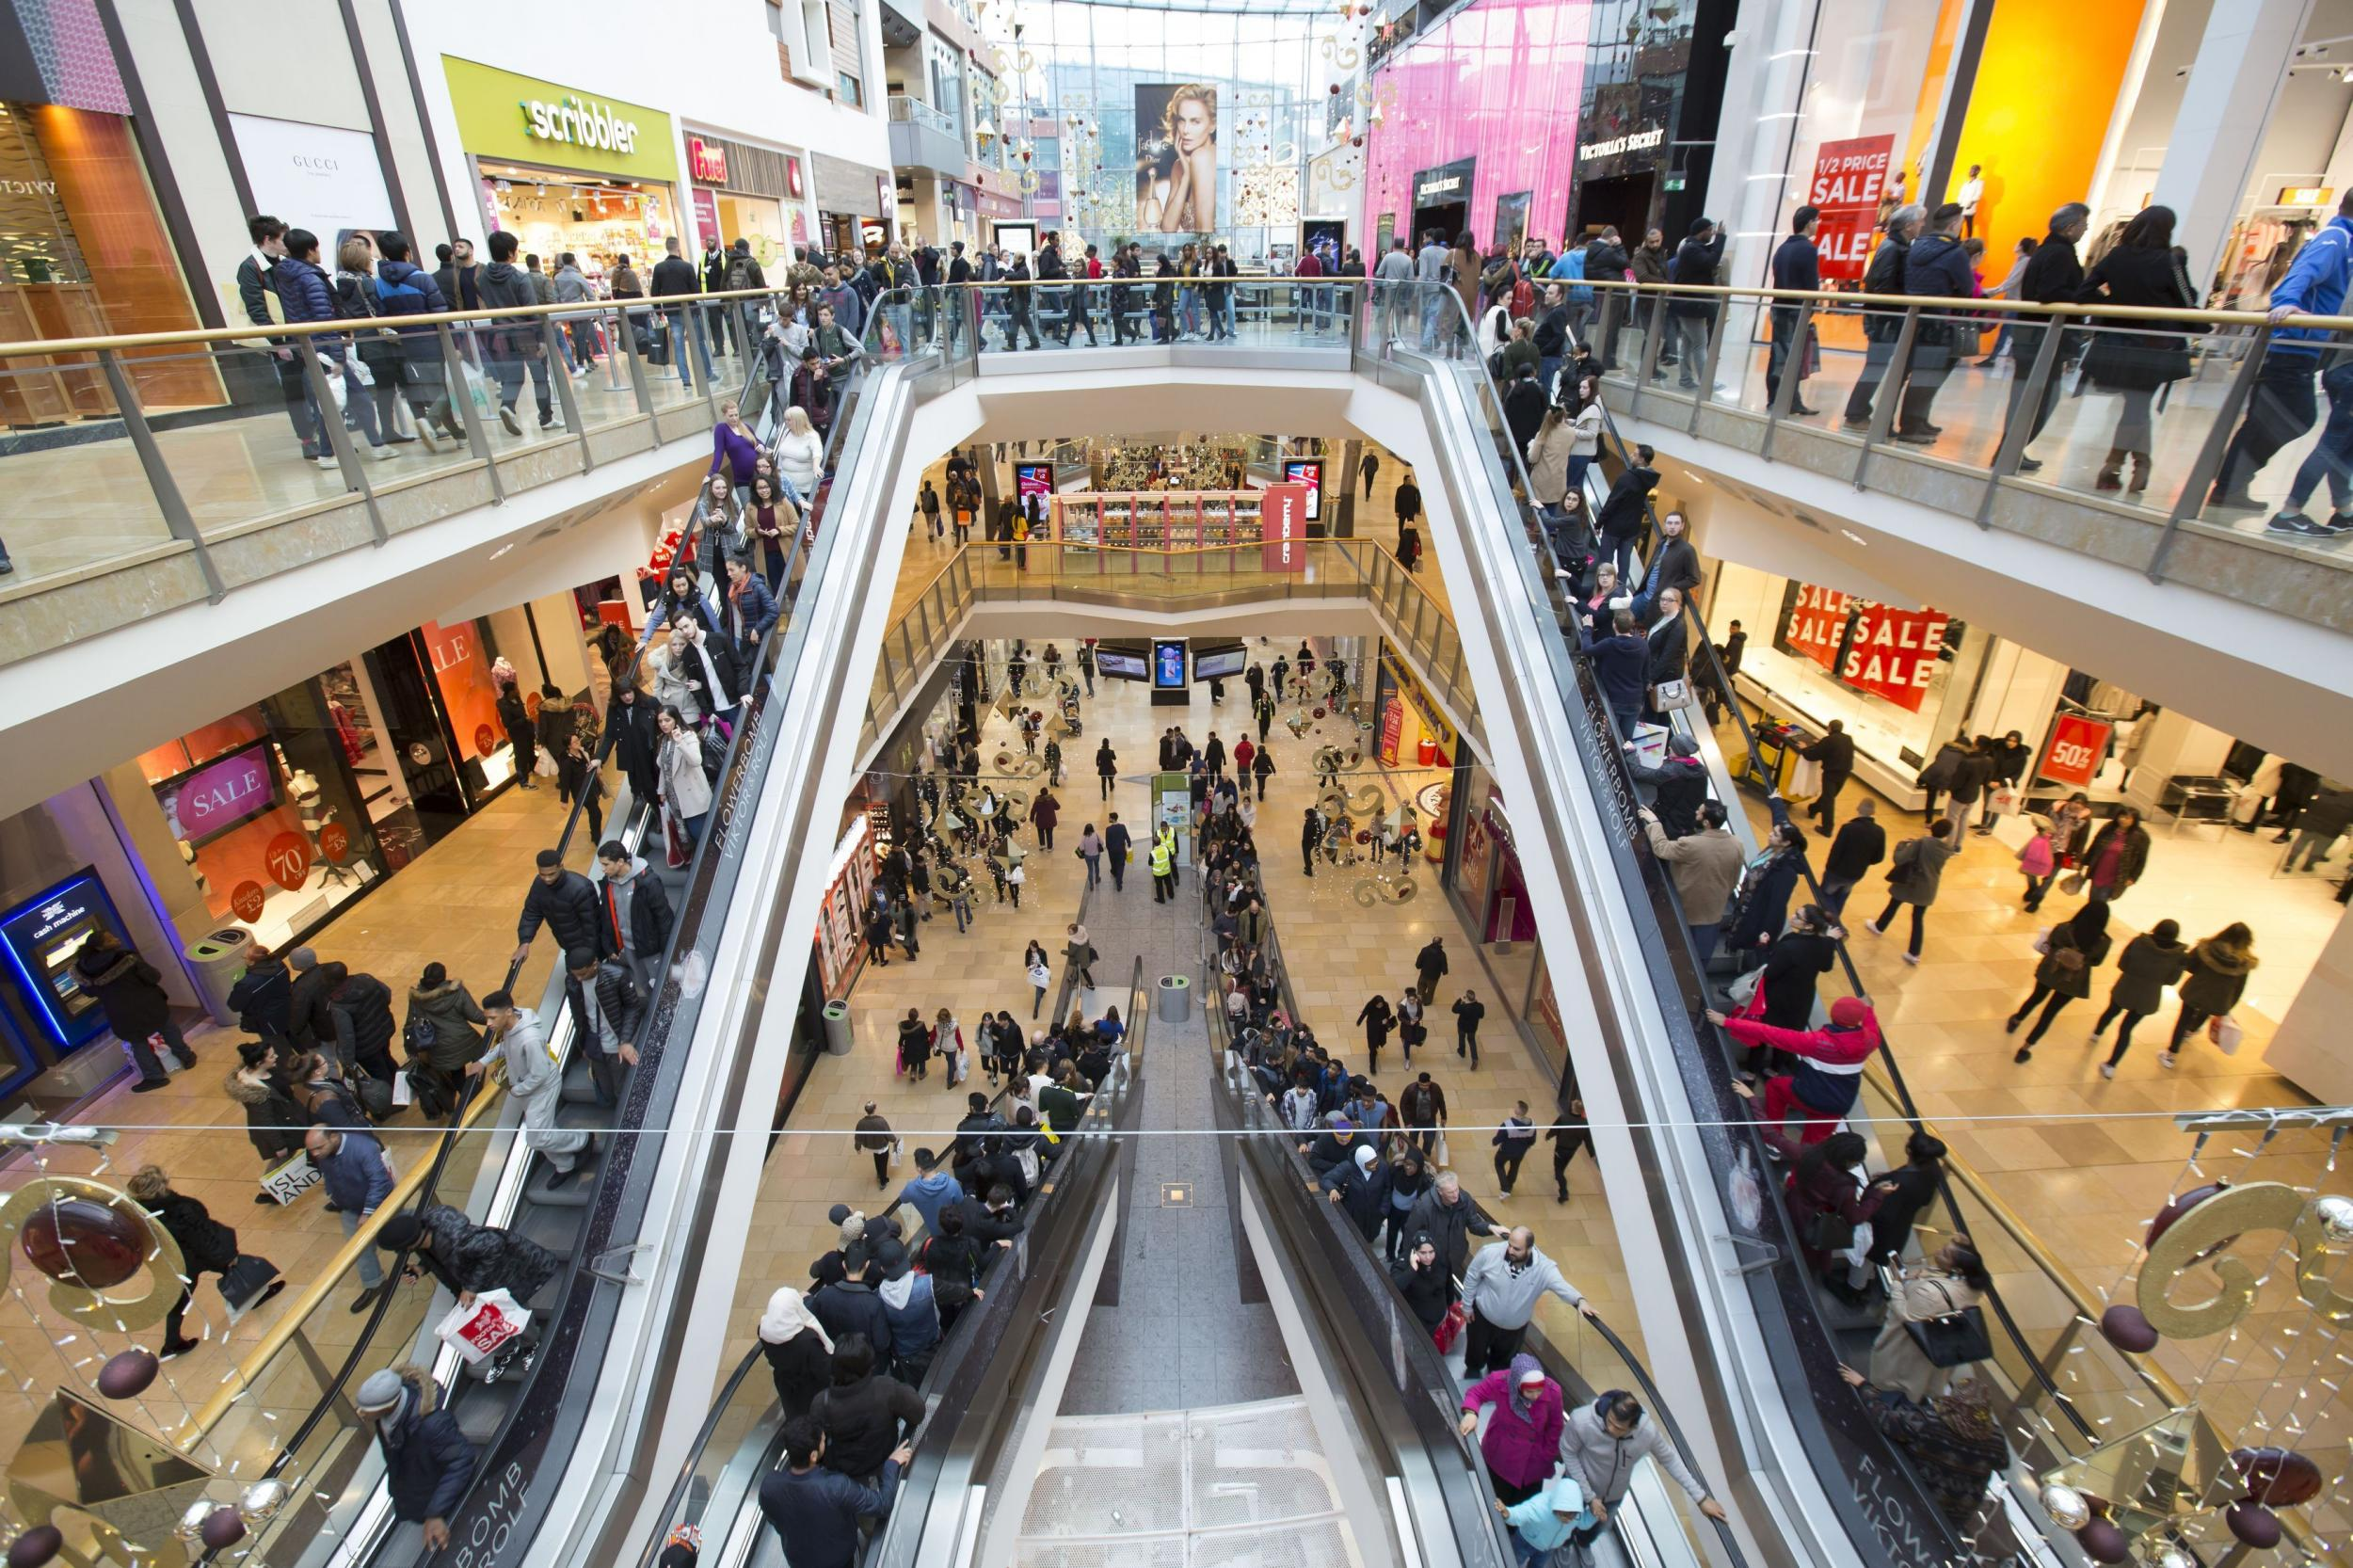 Coronavirus: Shopping centre owner Intu warns it will default on debts as retailers stop paying rent during lockdown